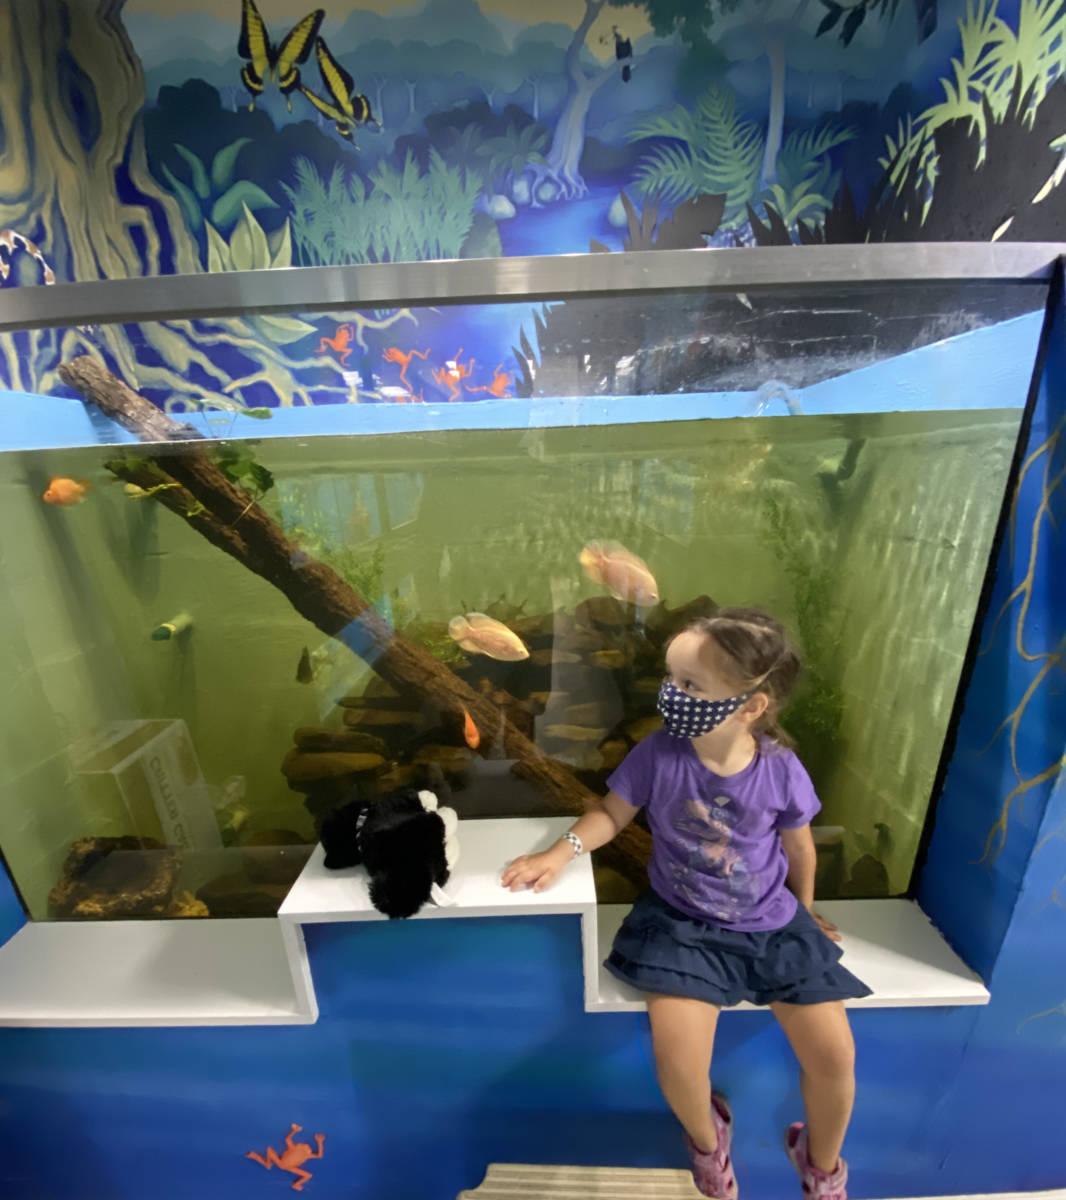 Visit The Animal Store: Vika and the giant aquarium